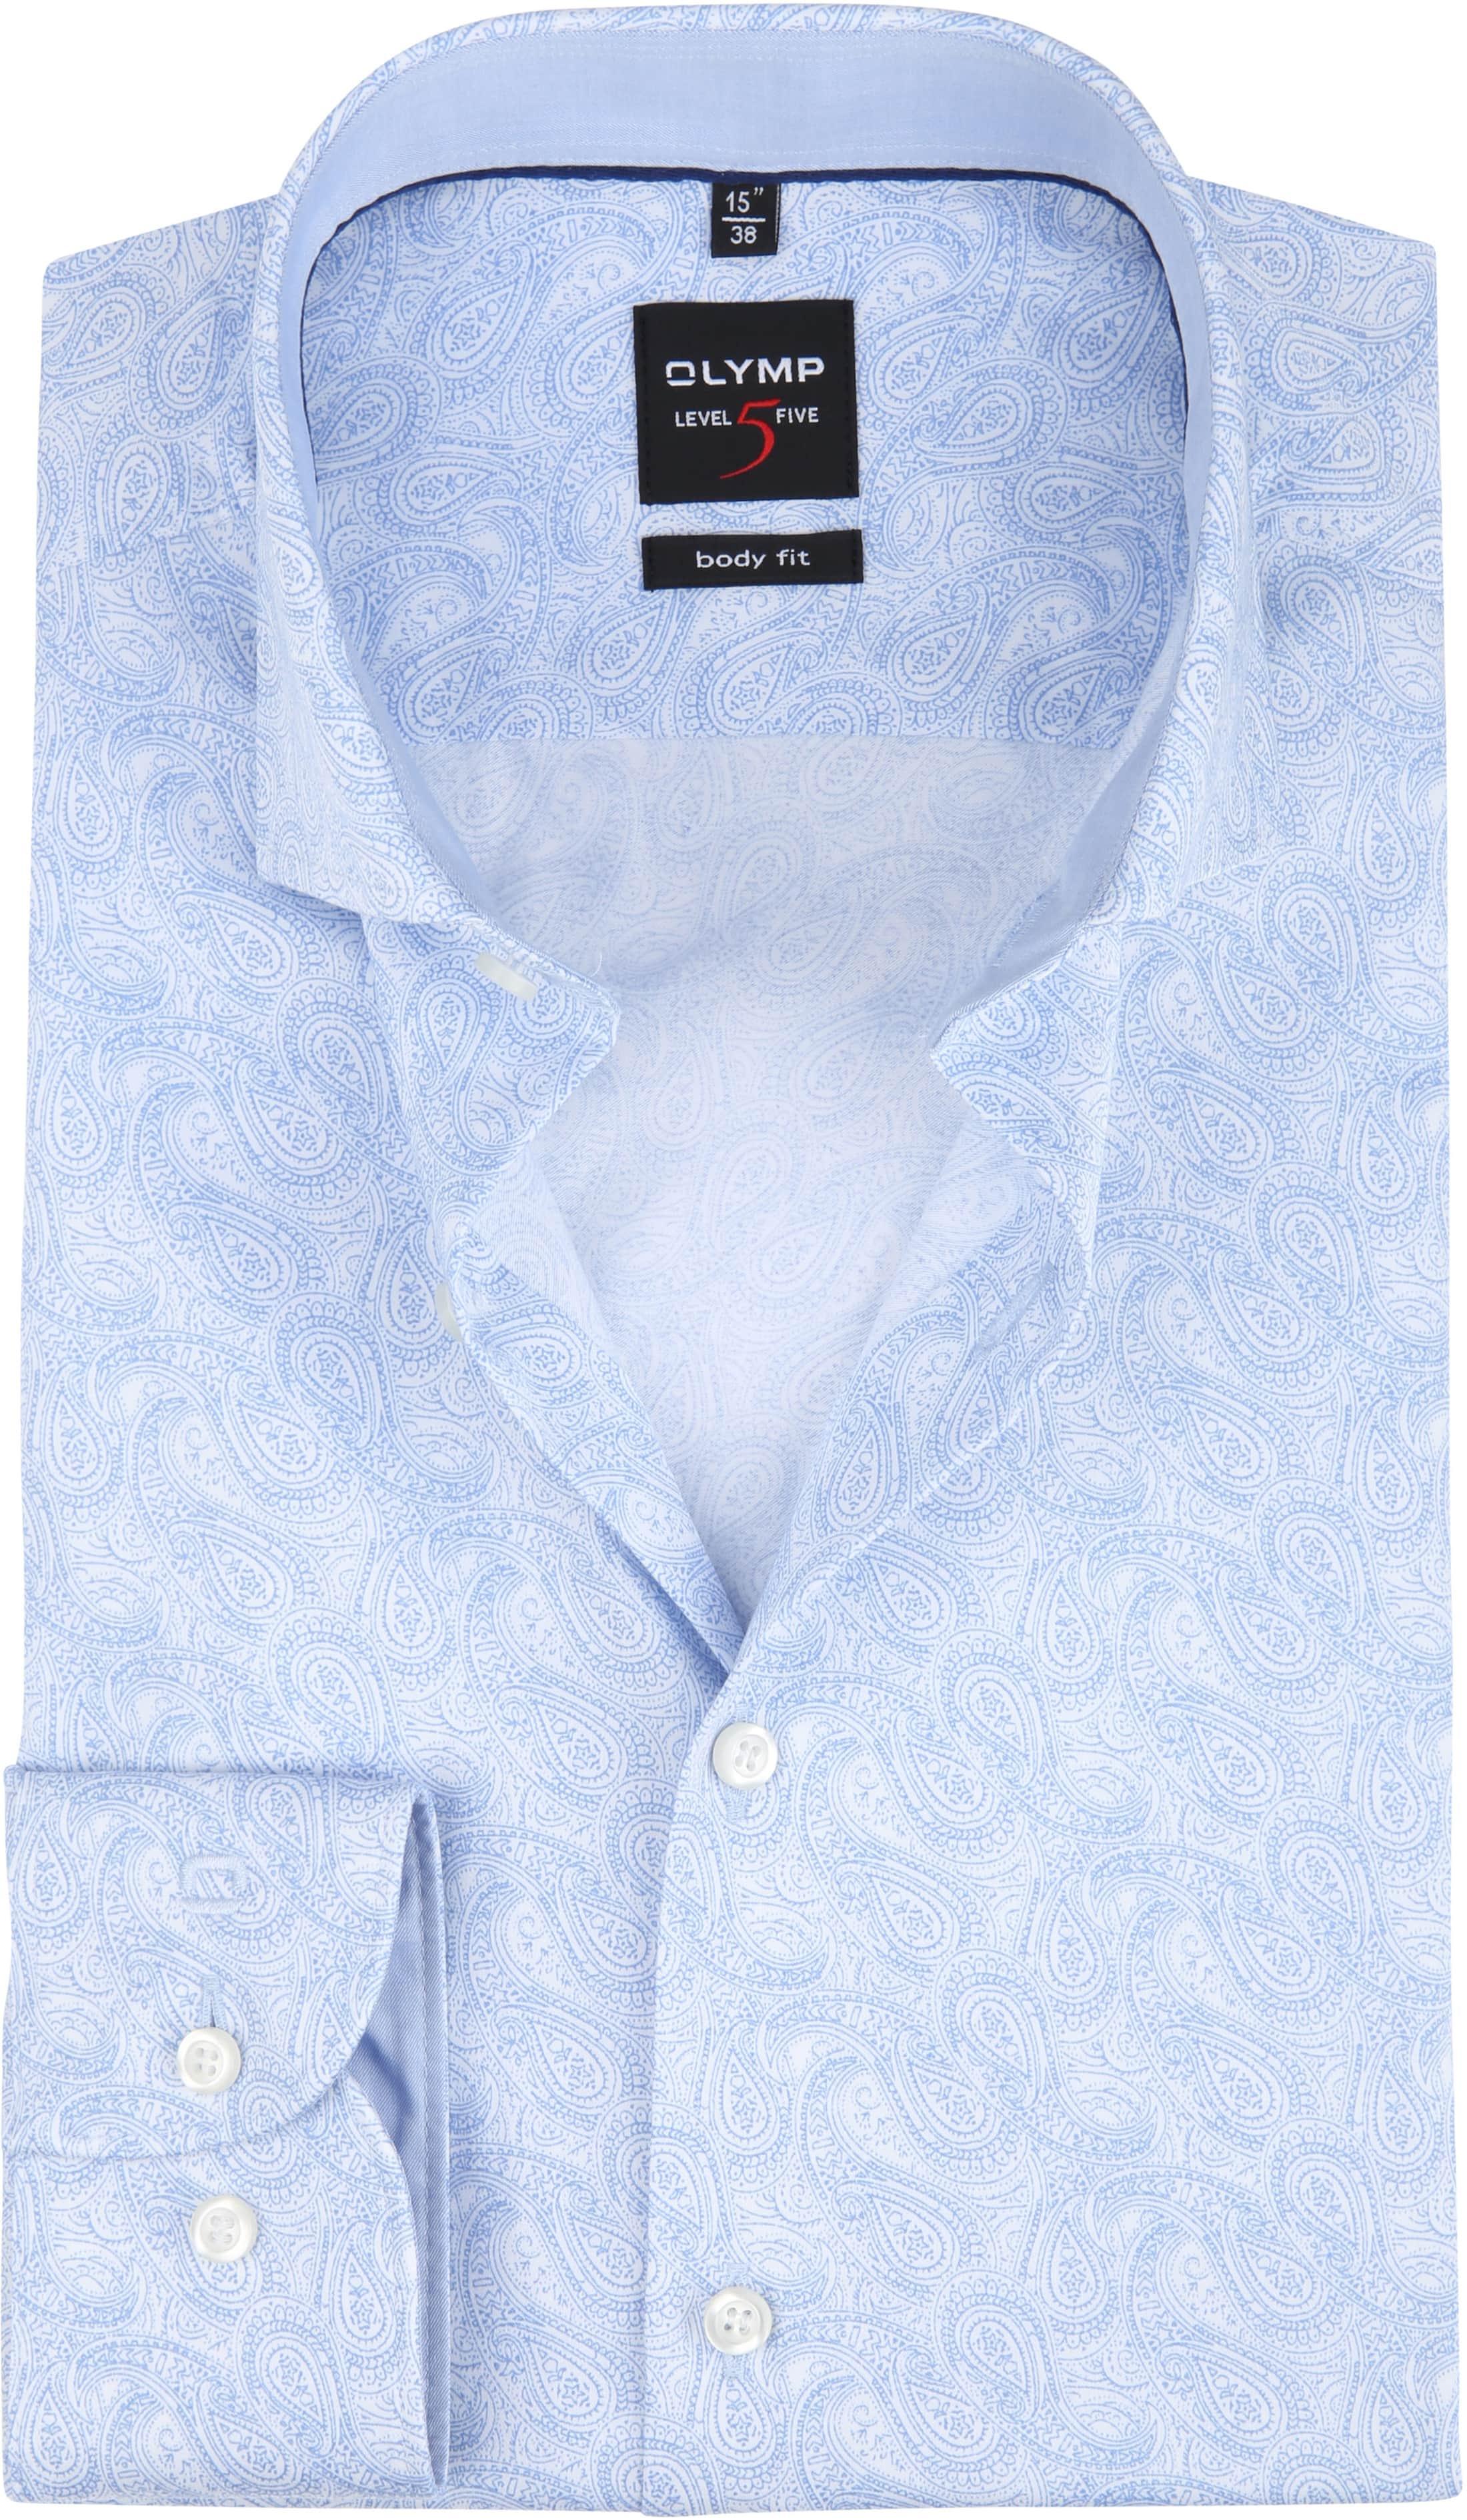 OLYMP Overhemd Level 5 Paisley Blauw foto 0